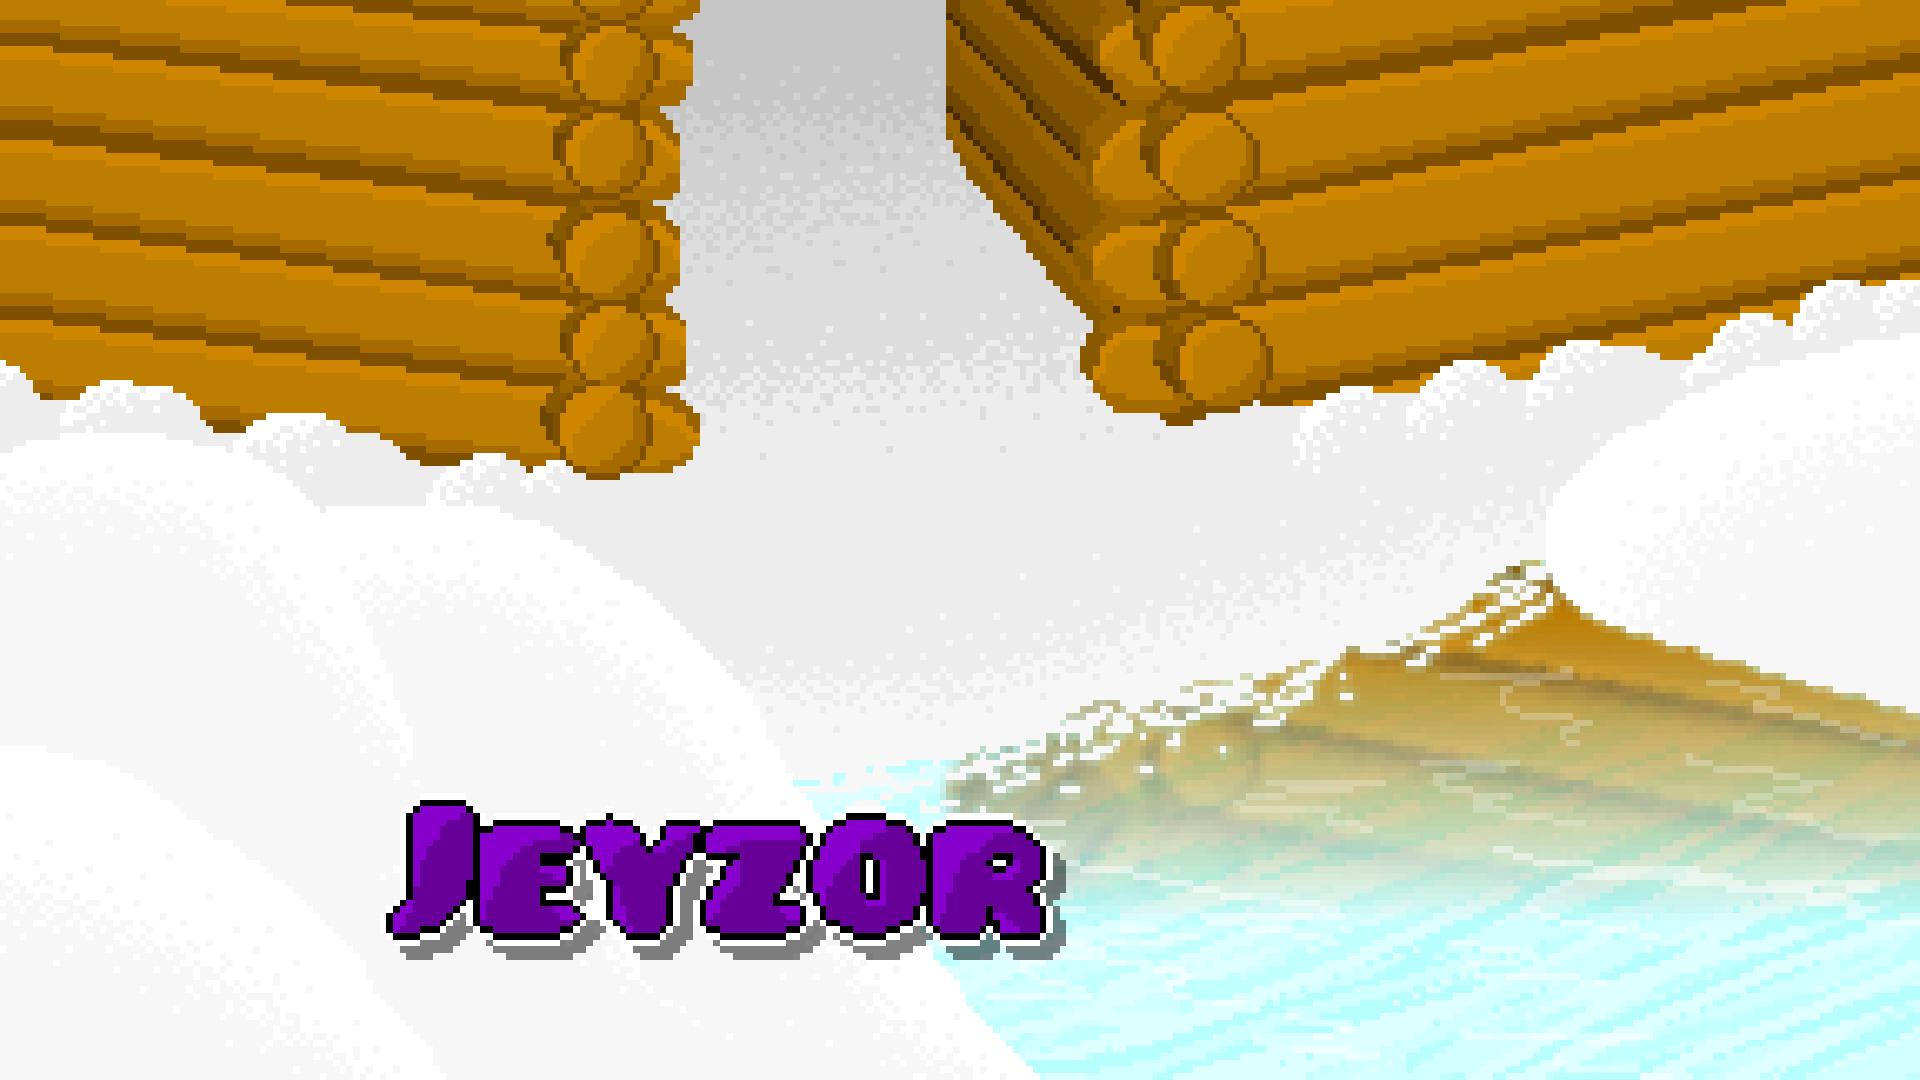 Chilly snow pixel art [wallpaper]